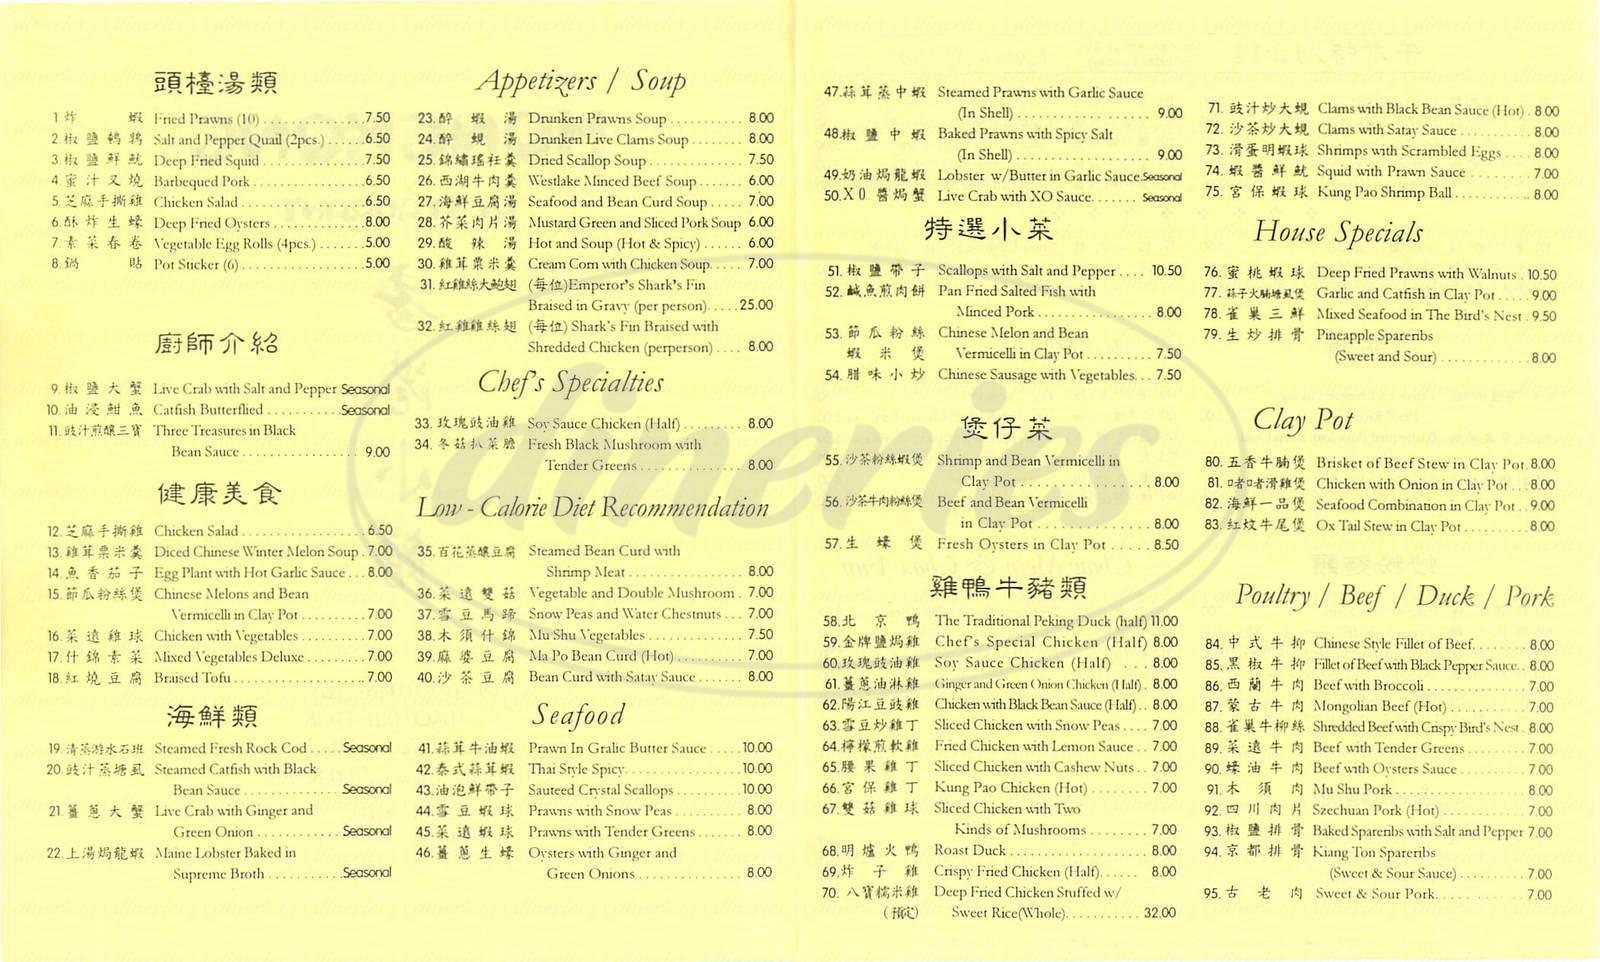 menu for Hong Kong Restaurant